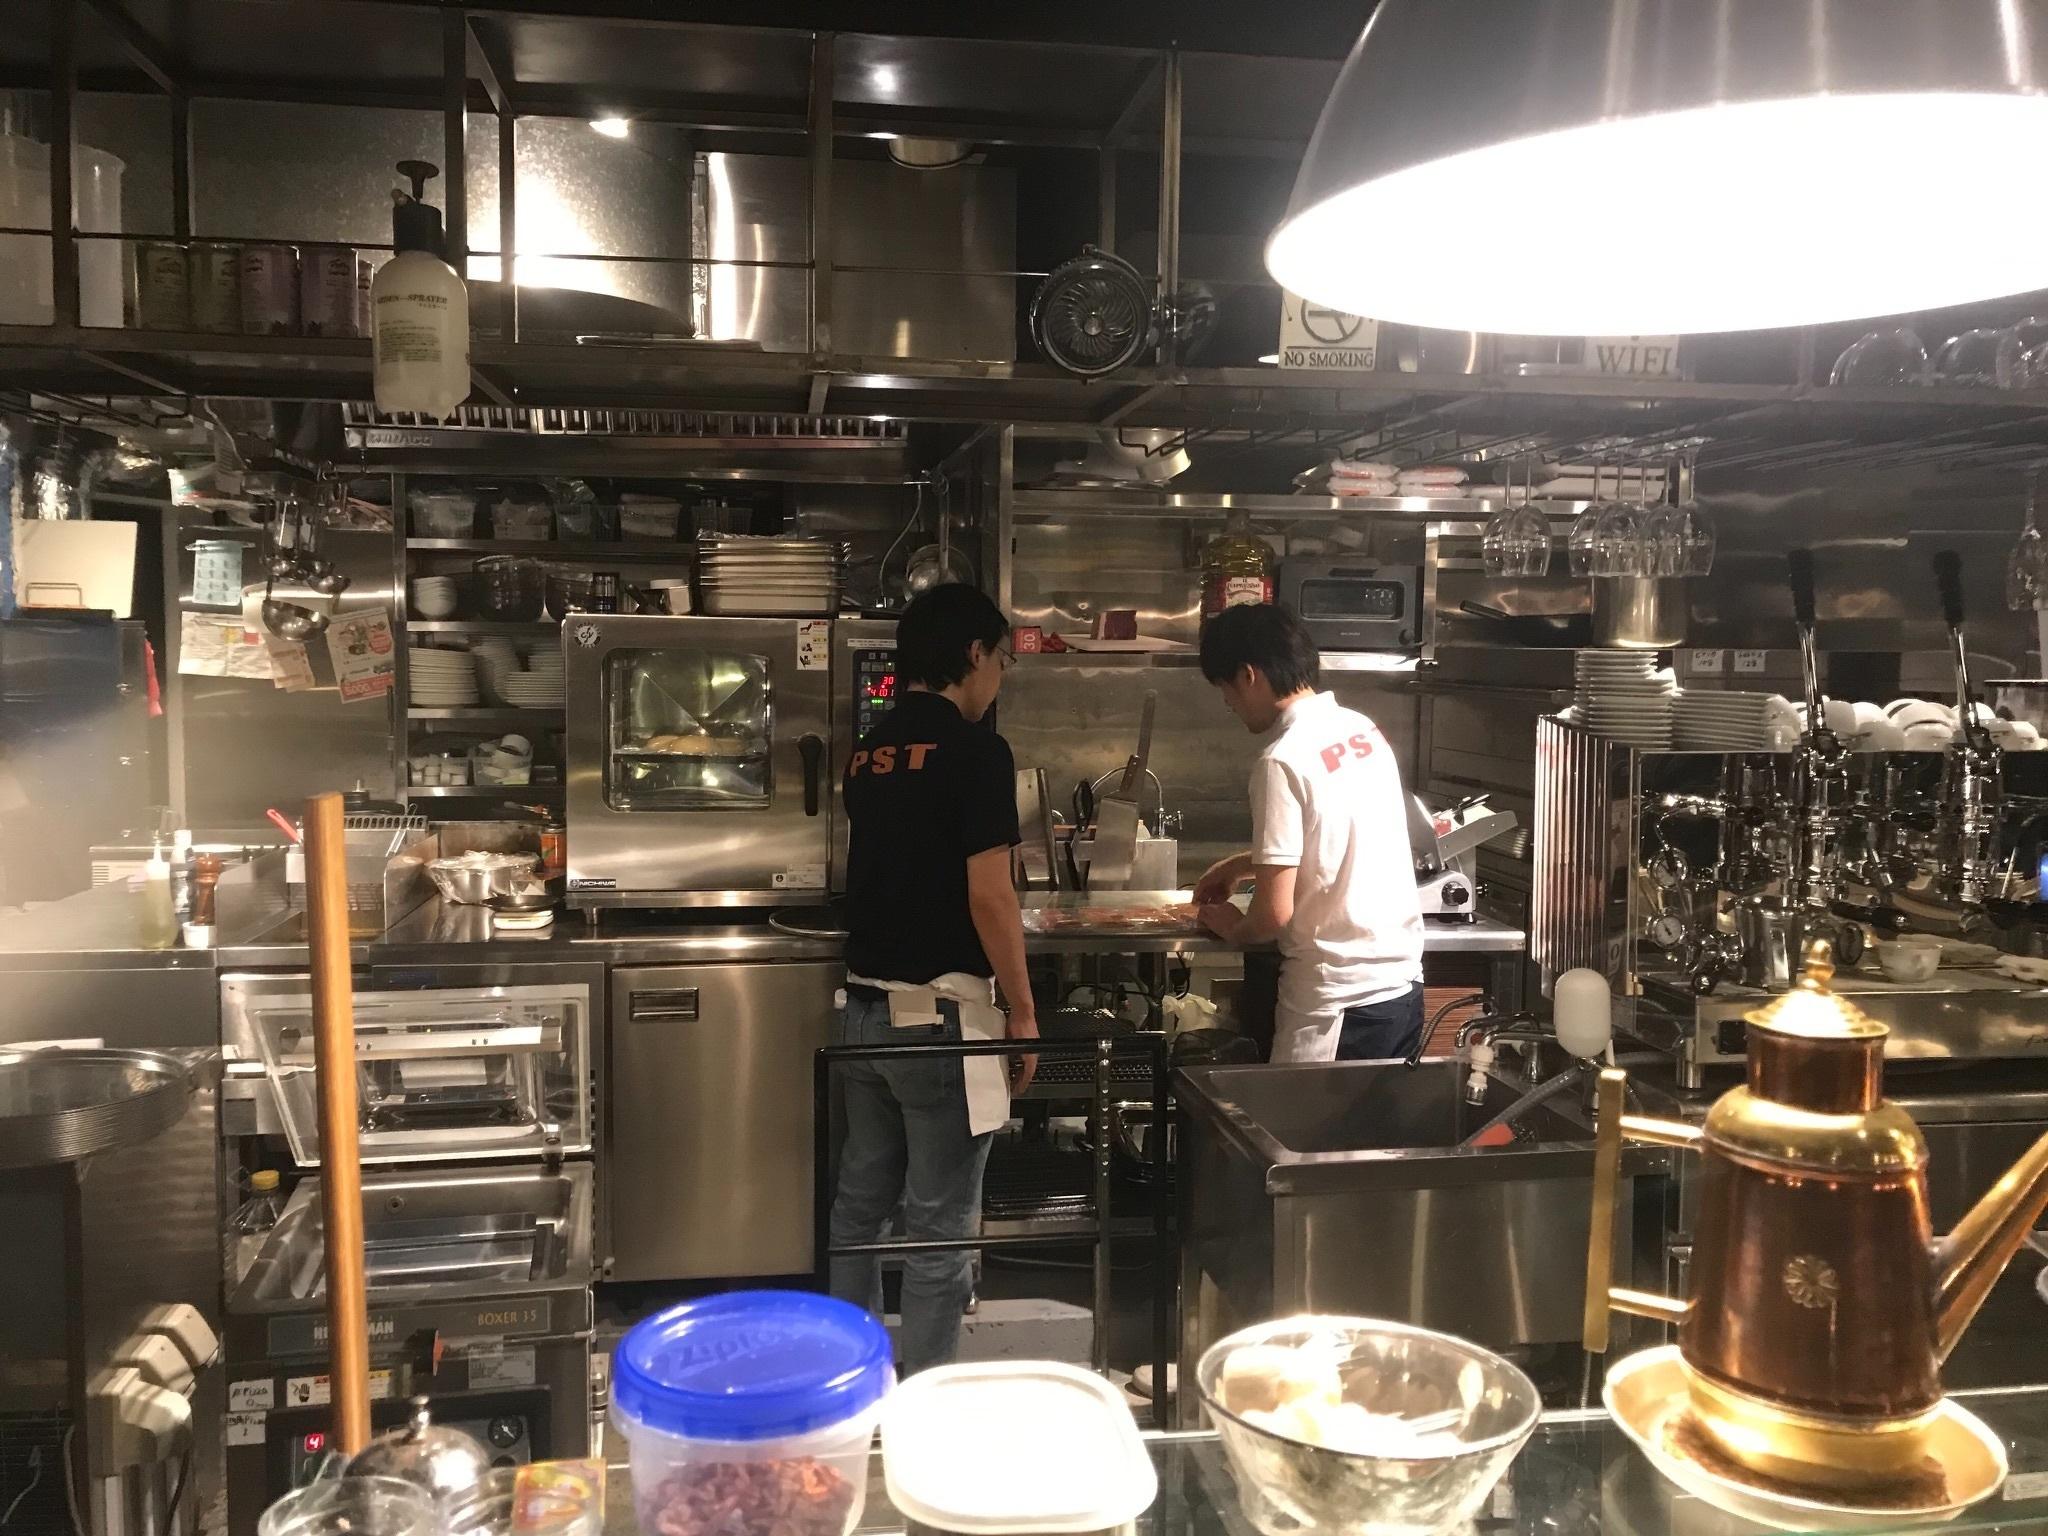 PST六本木 Pizza Studio Tamaki Roppongi, Tokyo | Reviews